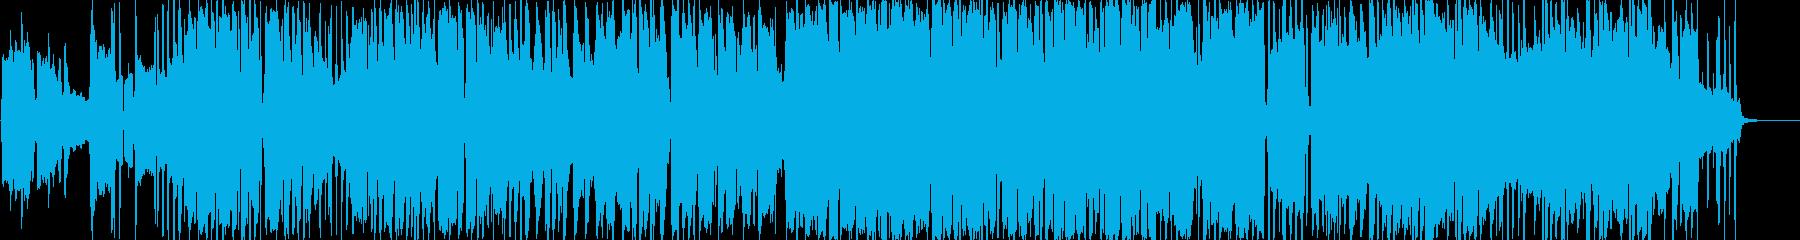 Melancholic folk pop with  harmonica's reproduced waveform